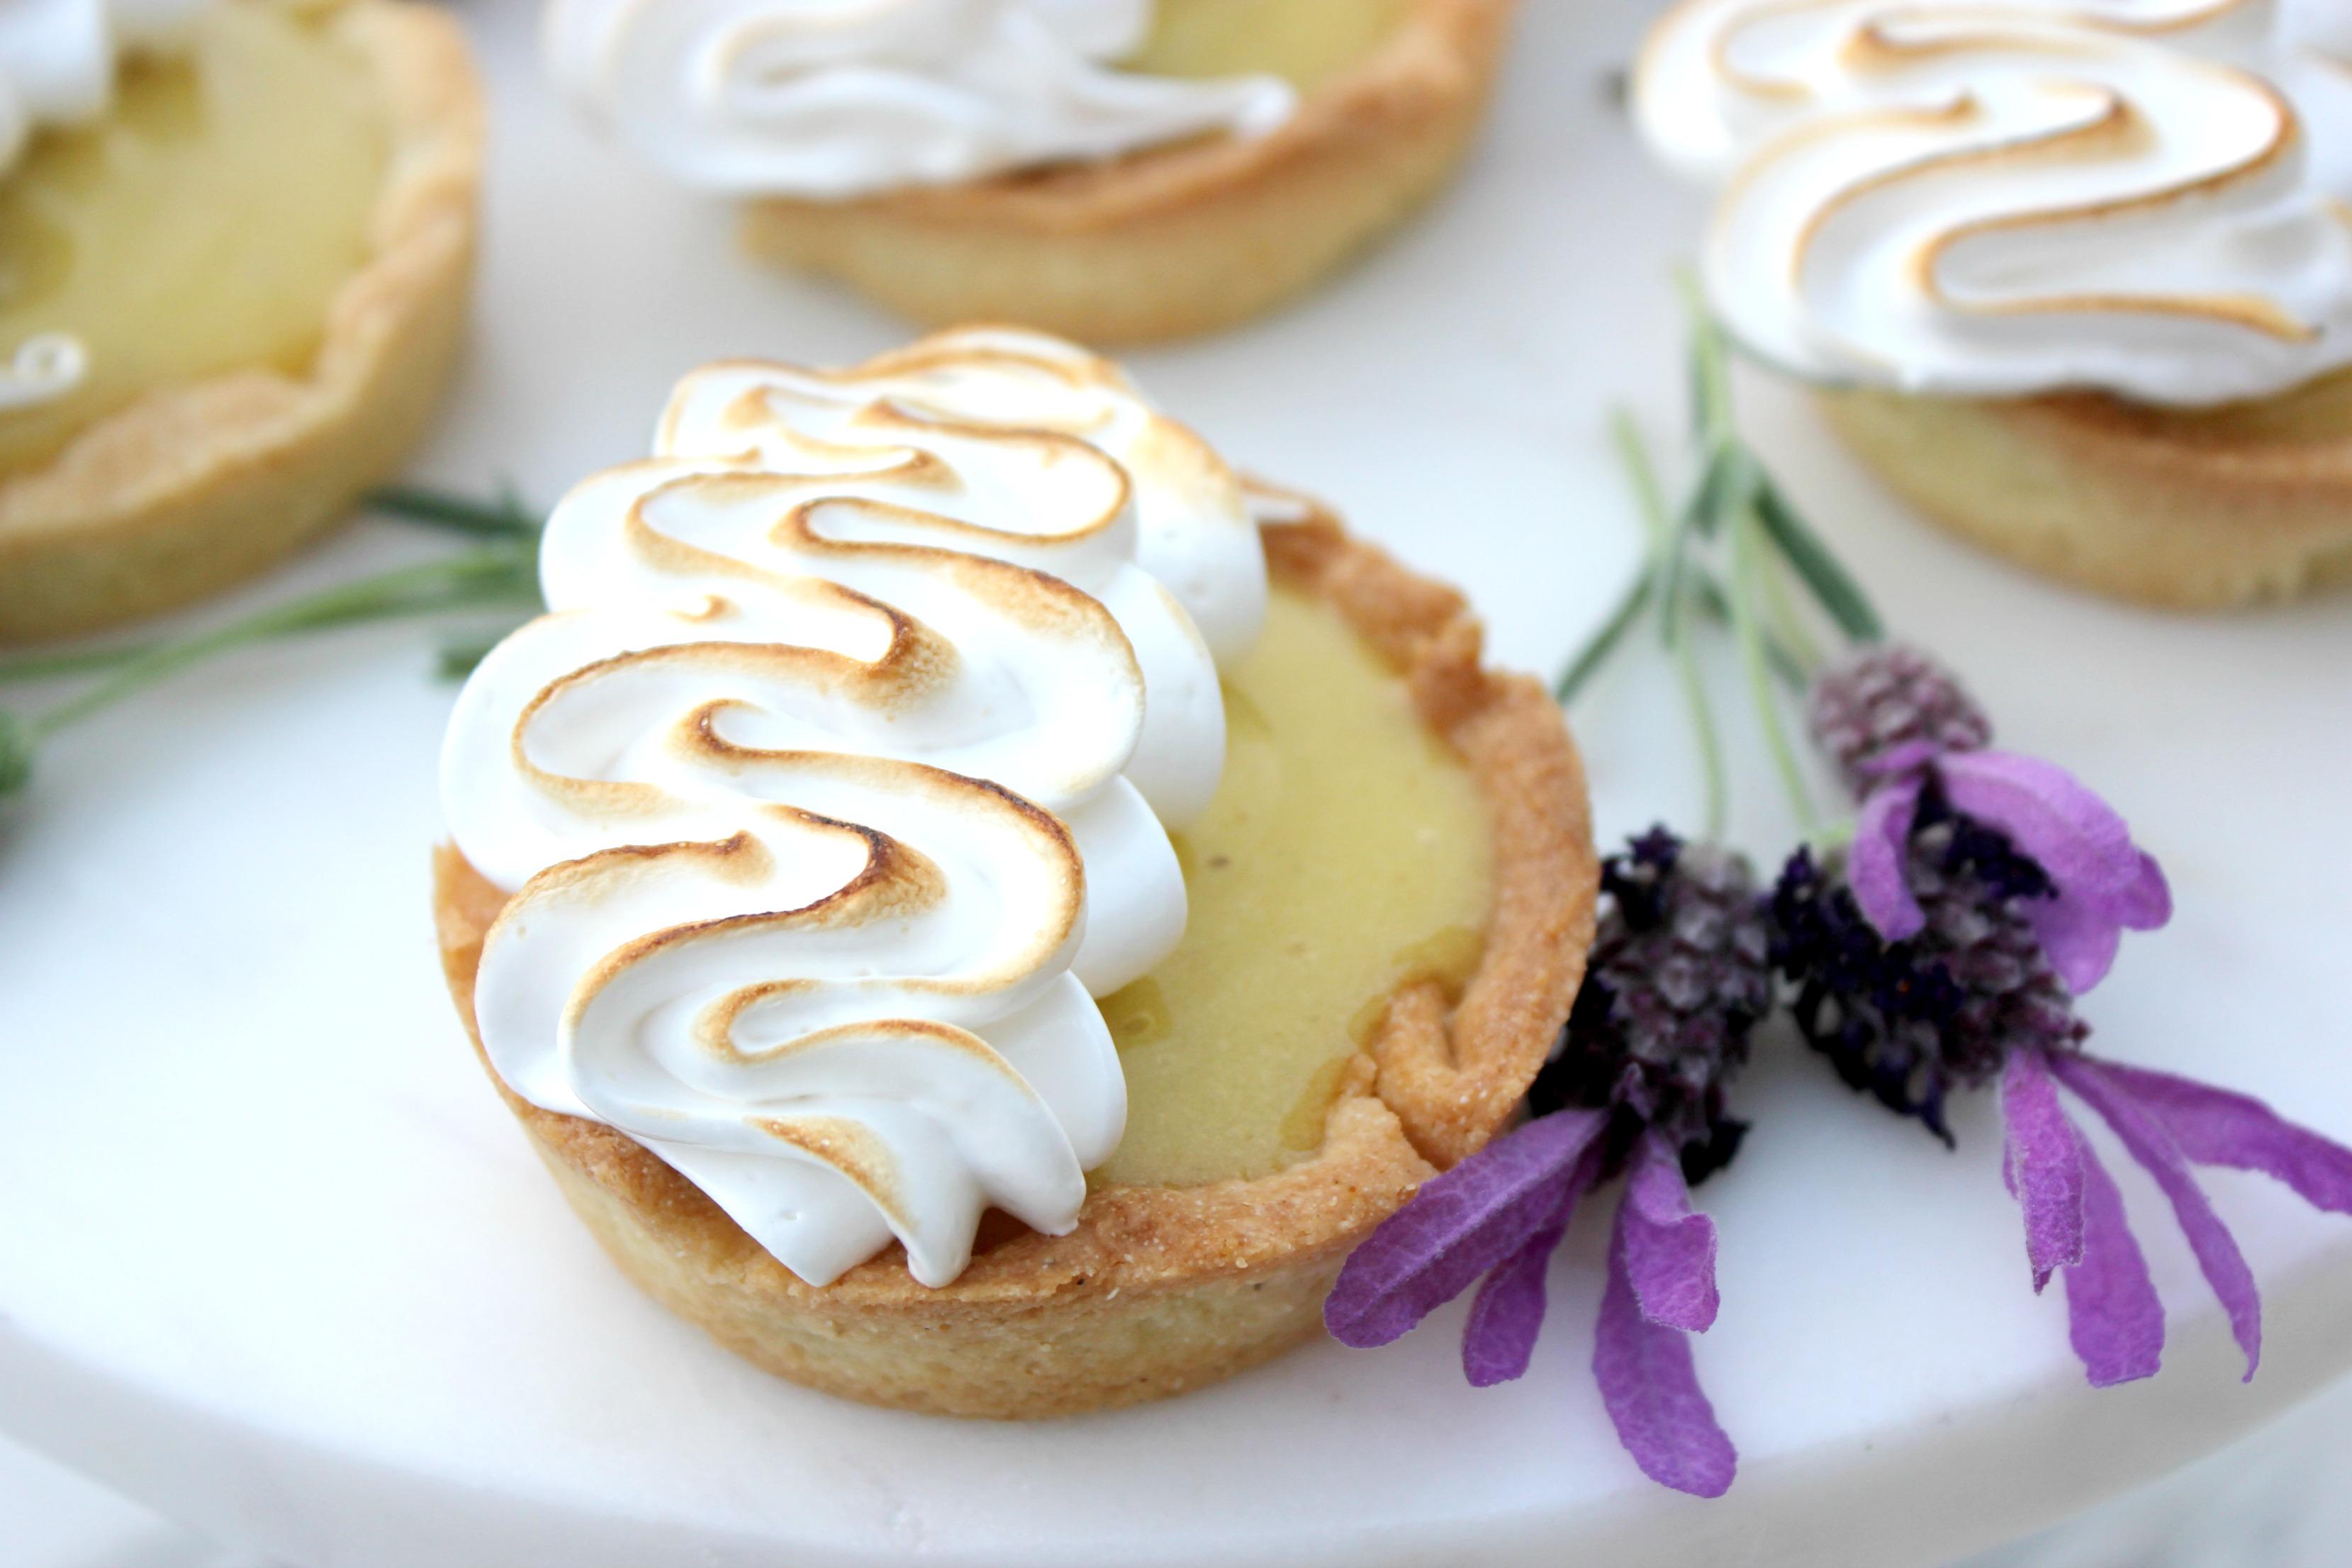 Gluten-Free Lemon Lavender Tarts